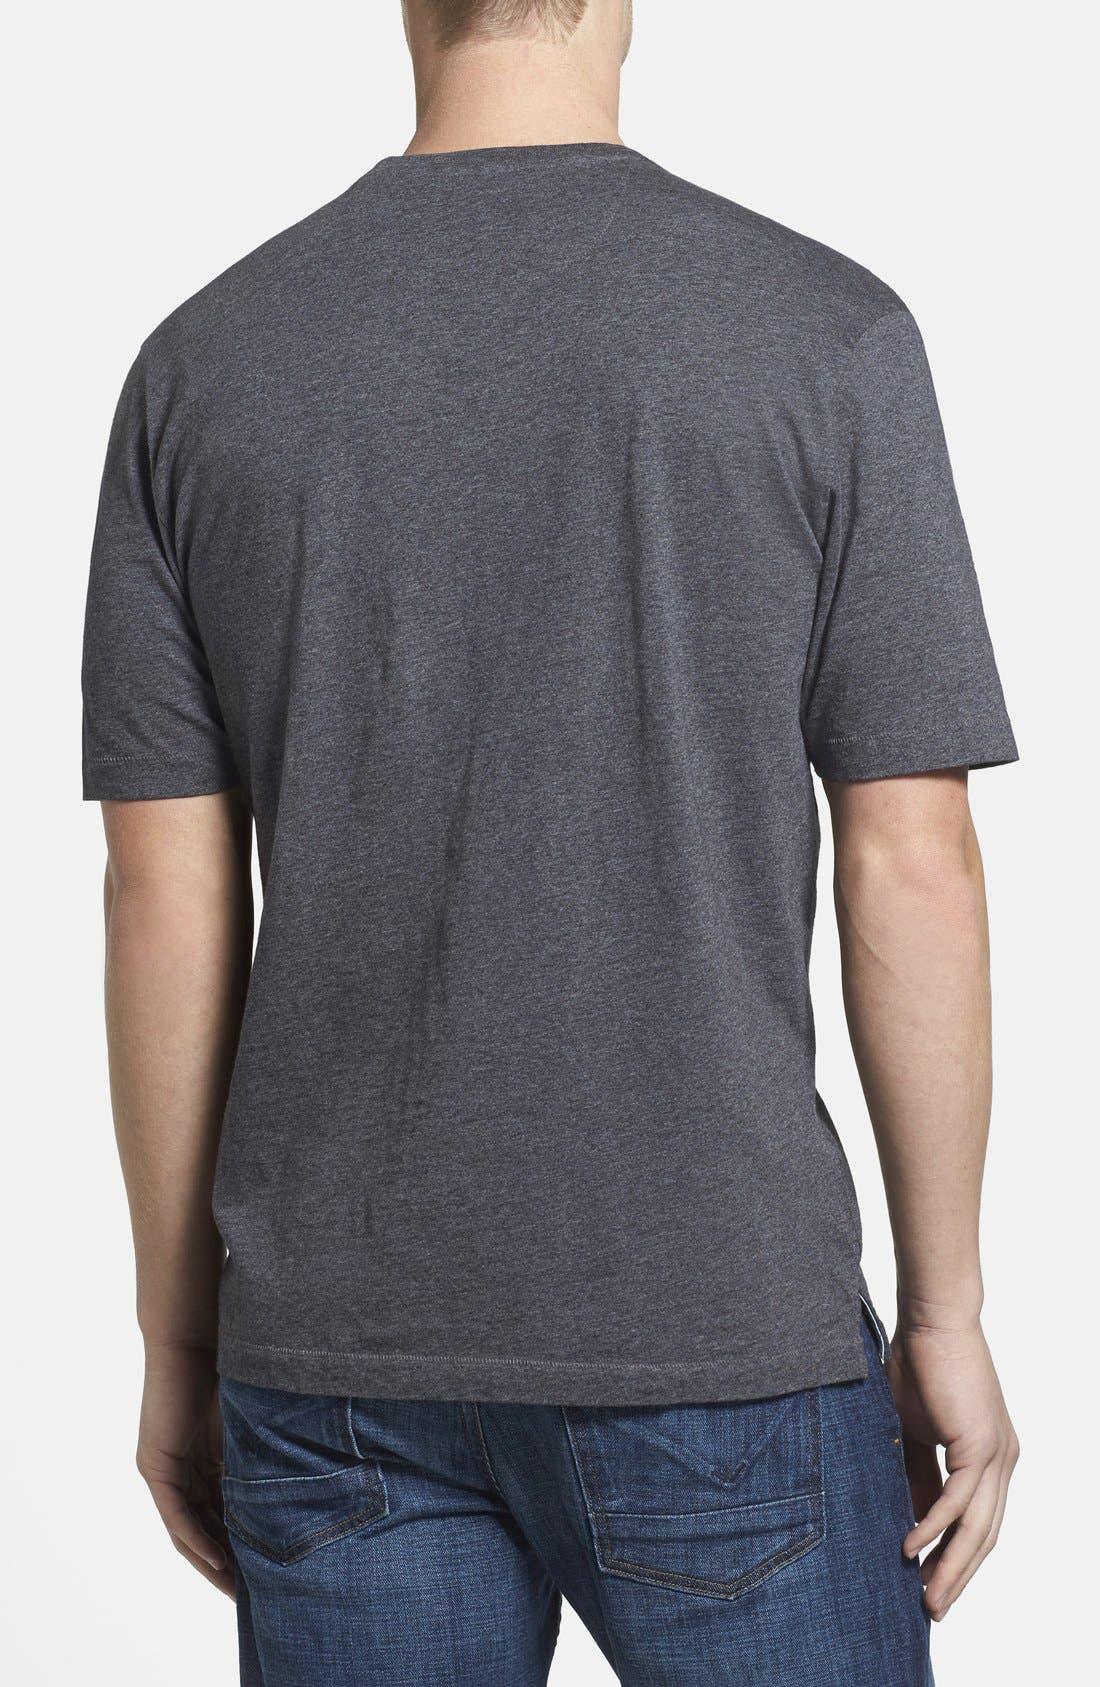 TOMMY BAHAMA, 'New Bali Sky' Original Fit Crewneck Pocket T-Shirt, Alternate thumbnail 8, color, CHARCOAL HEATHER